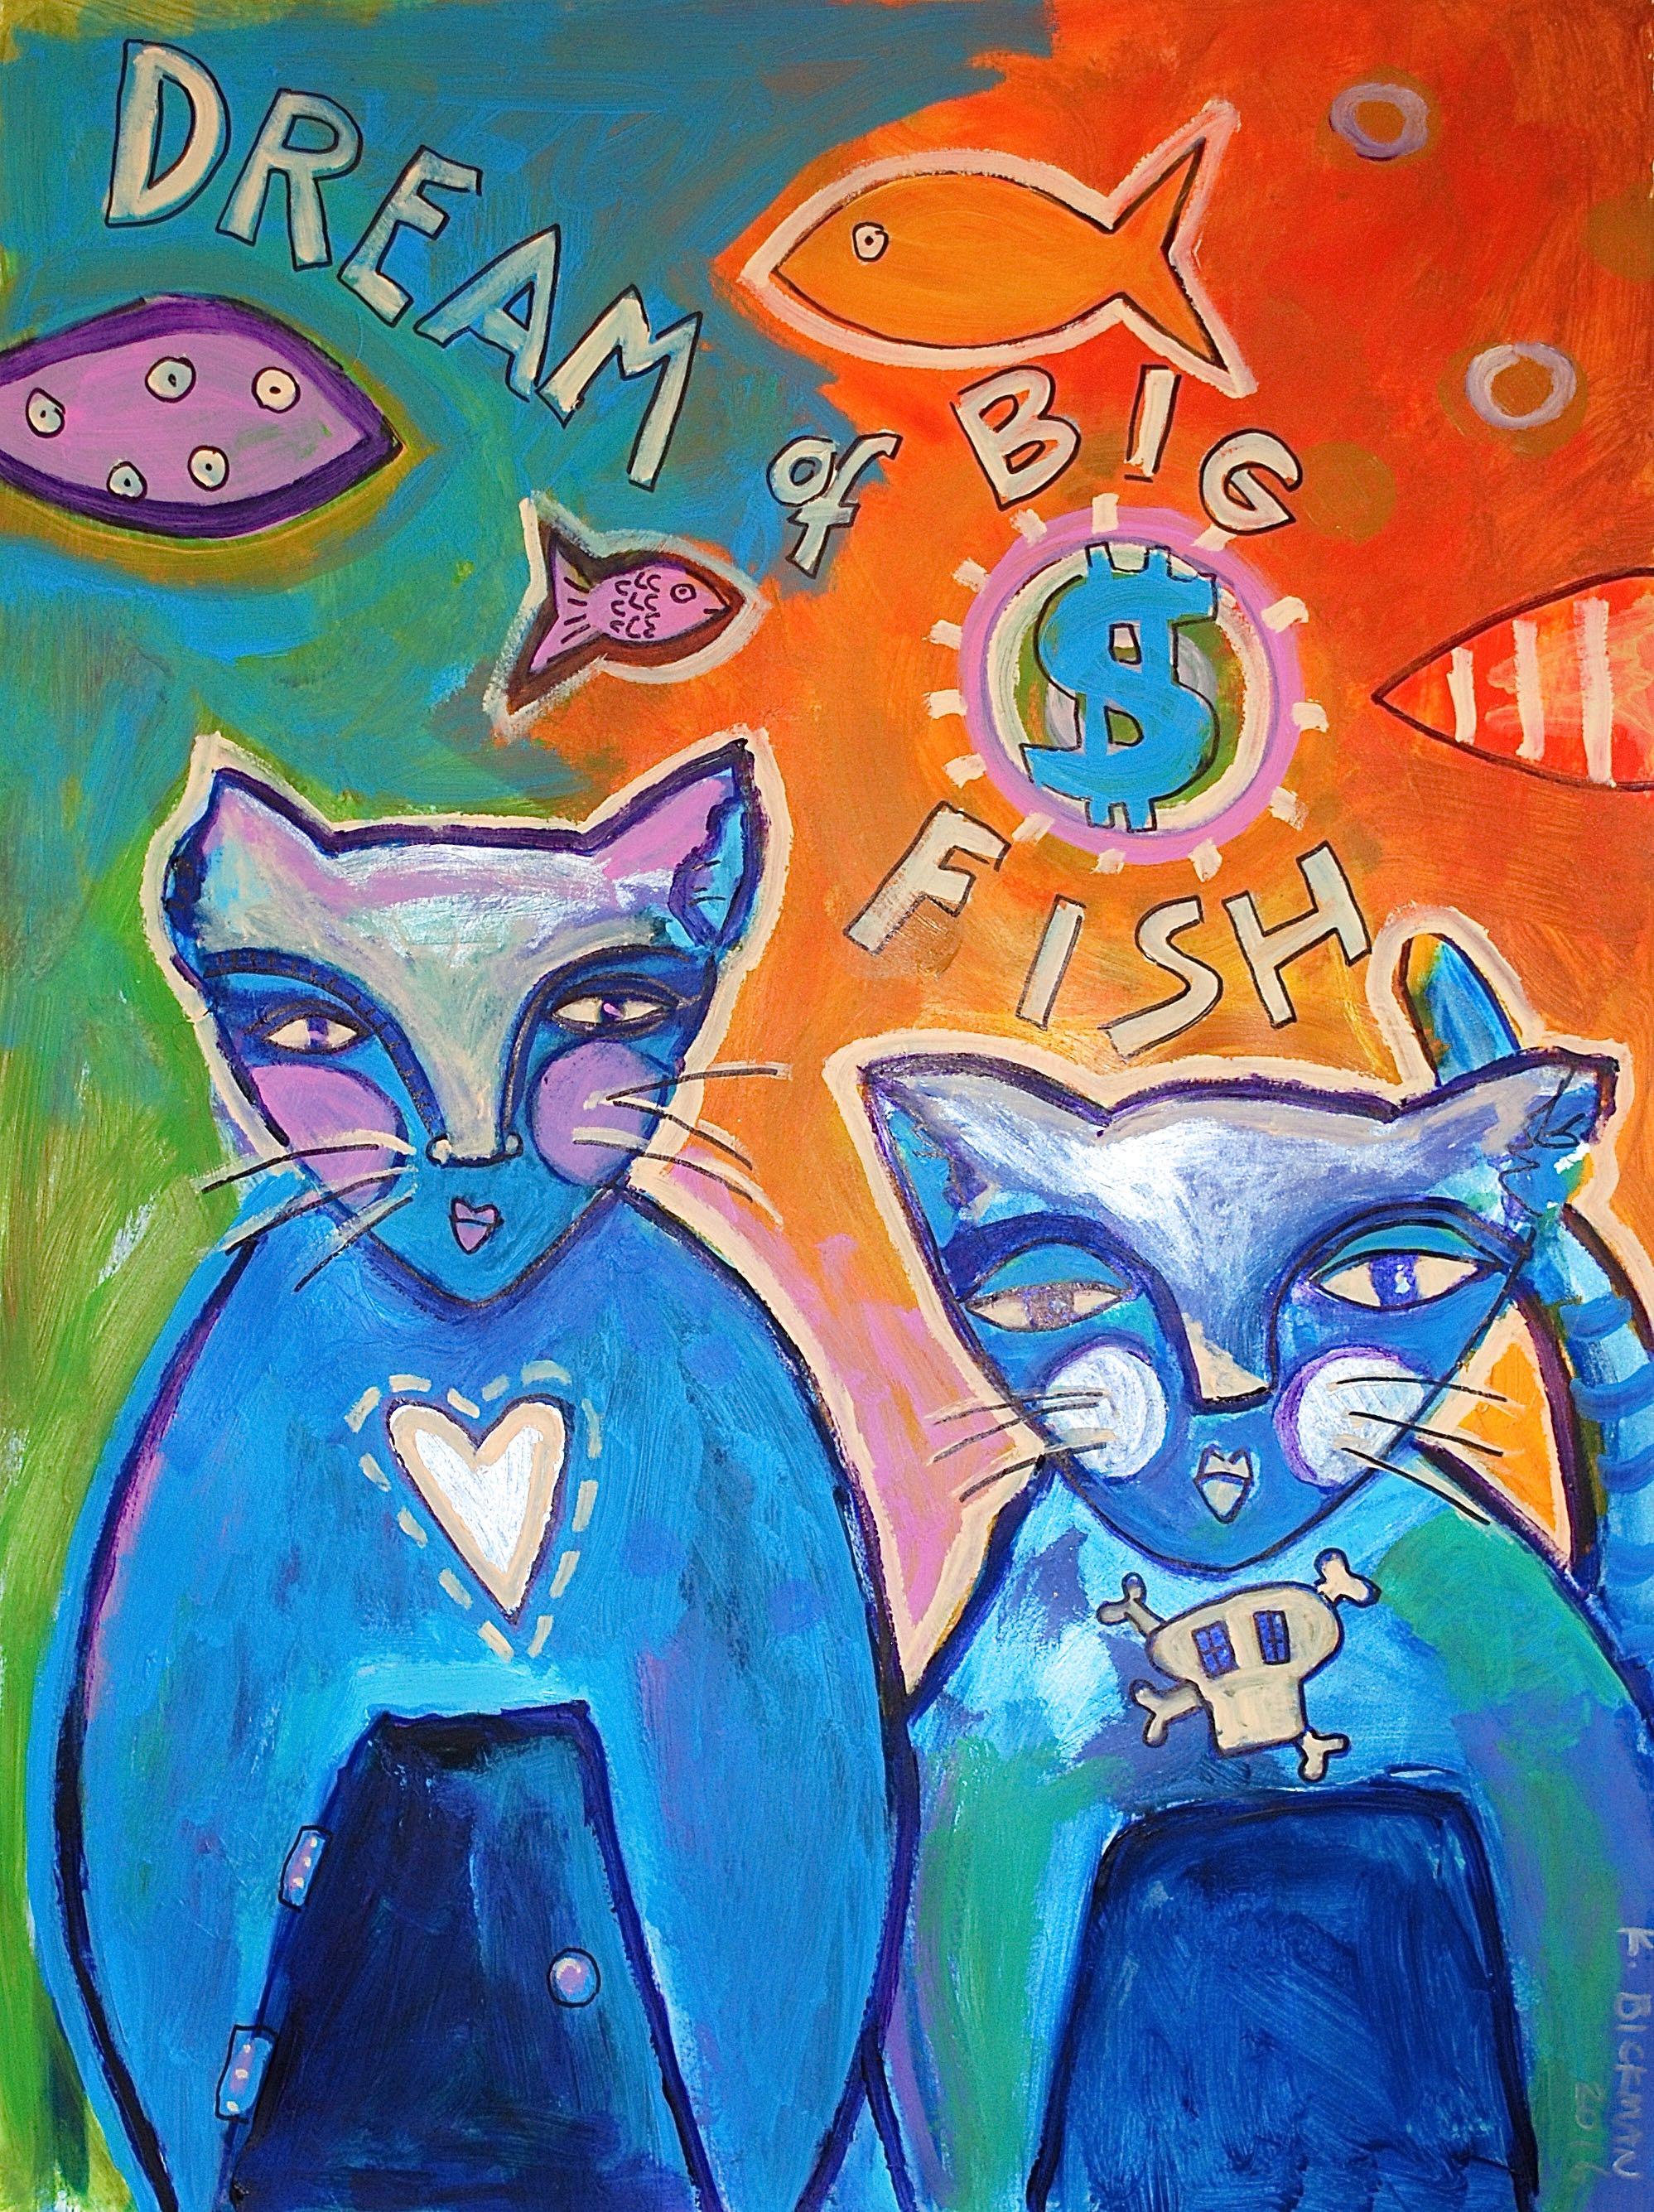 Dream of Big Fish